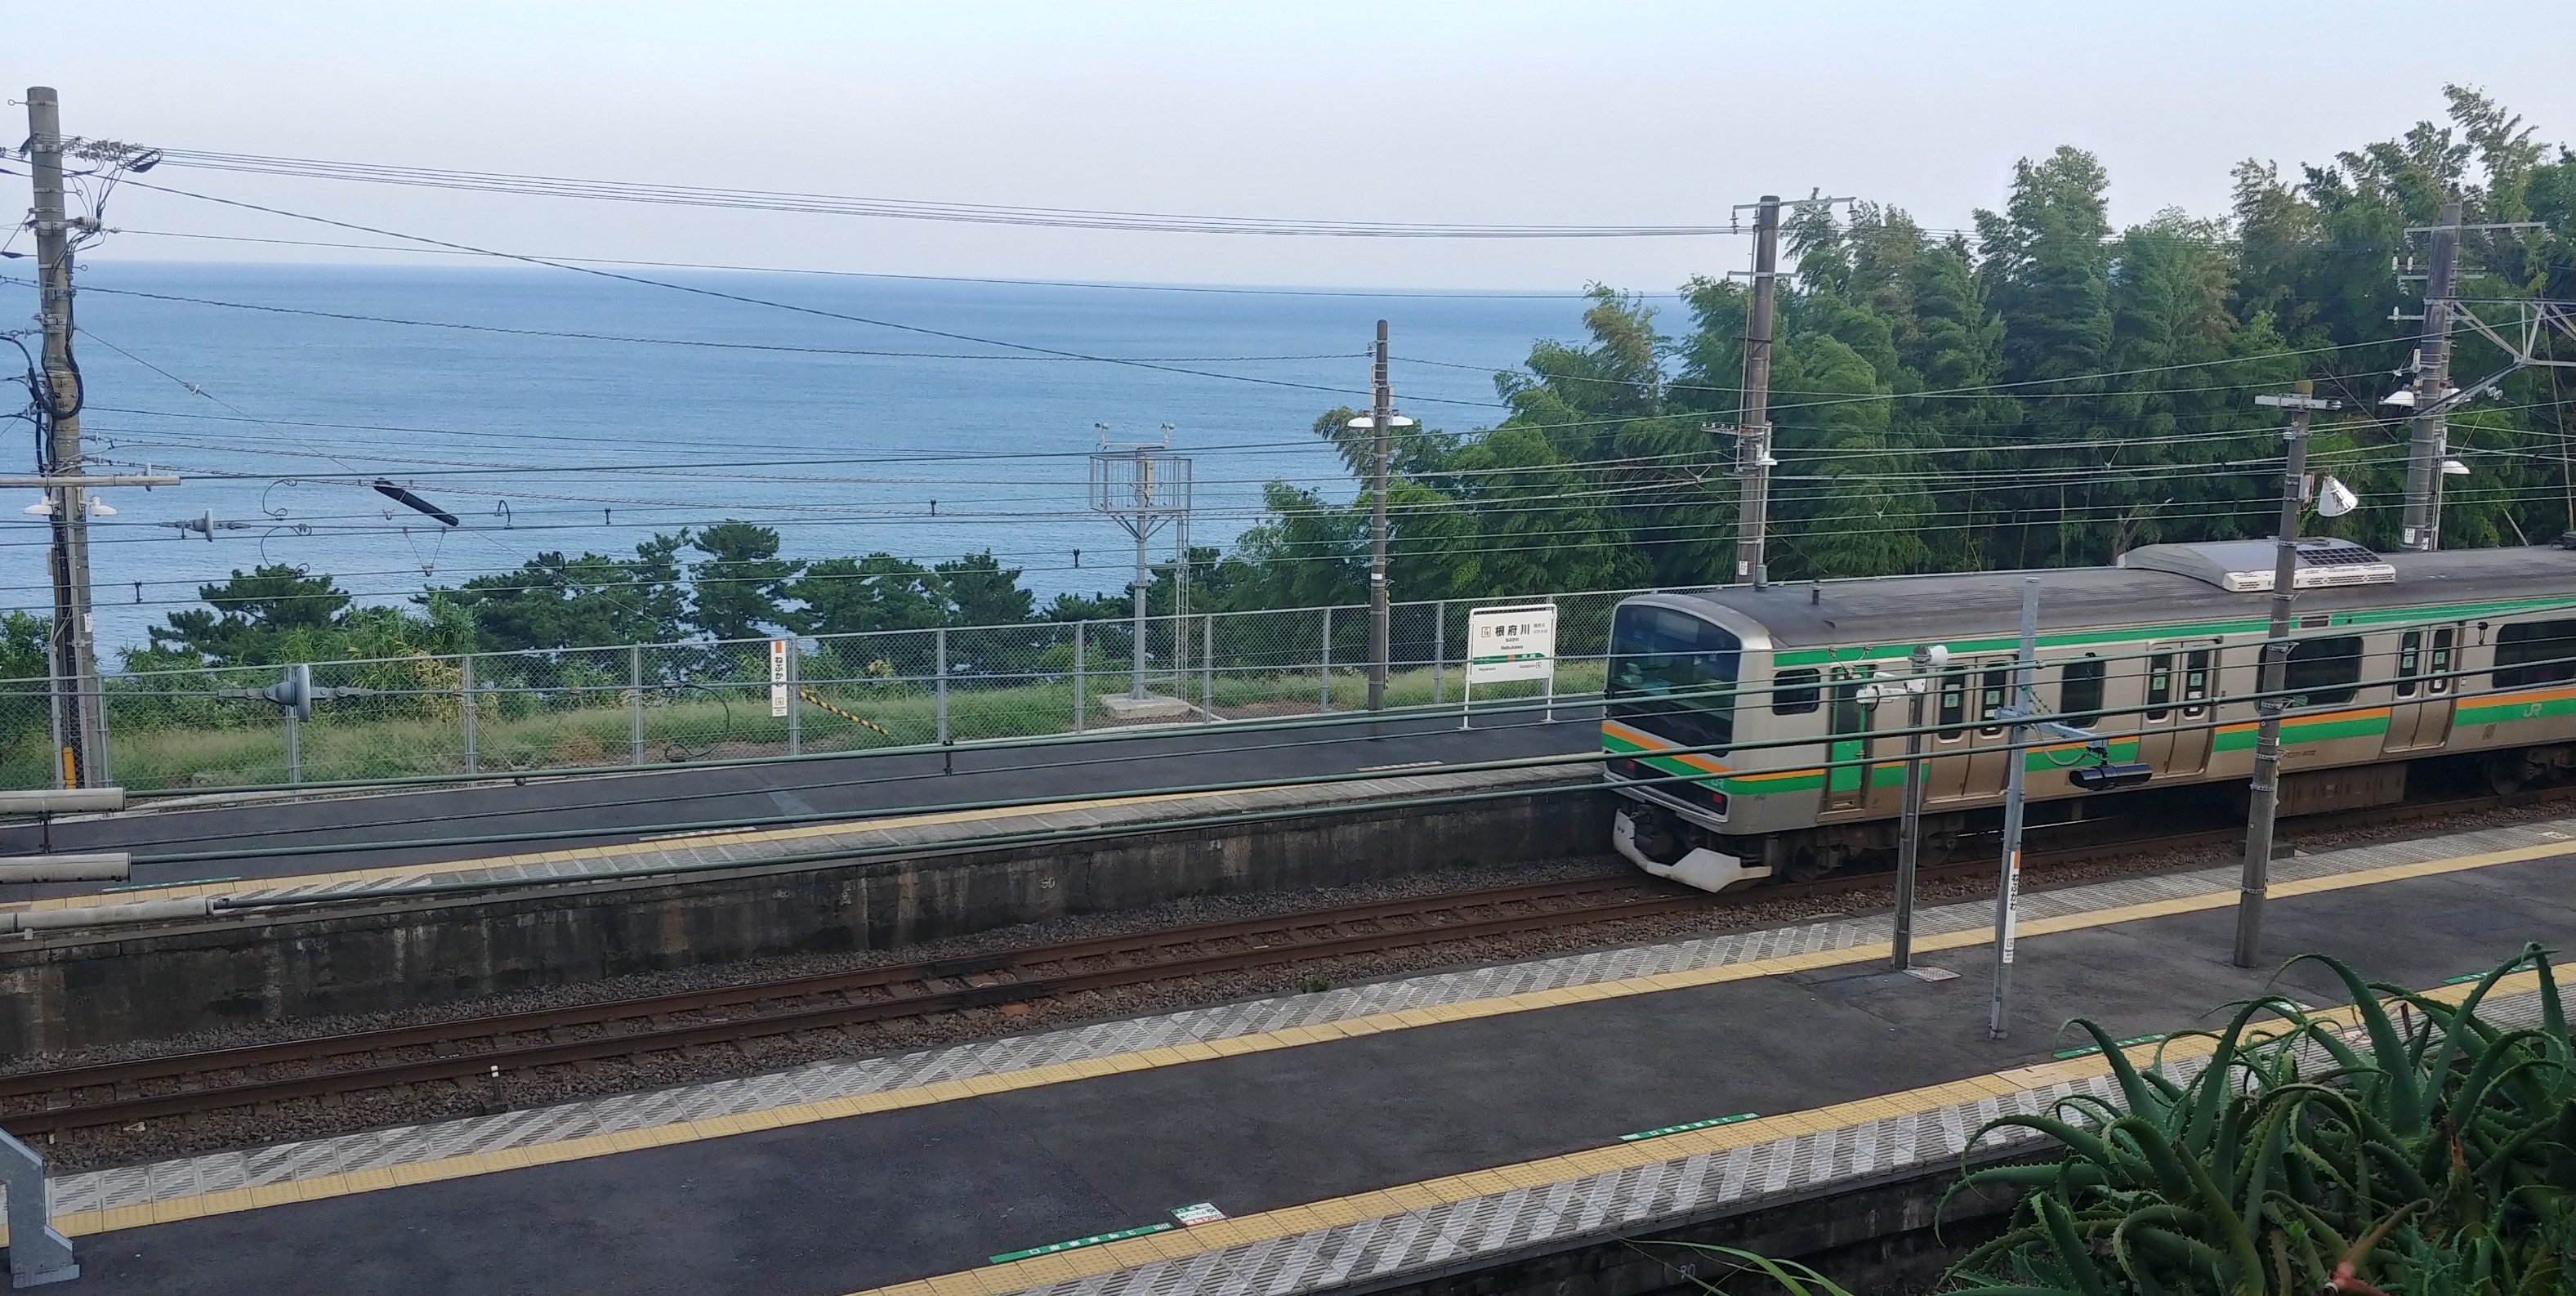 f:id:kishuji-kaisoku:20191106121243j:image